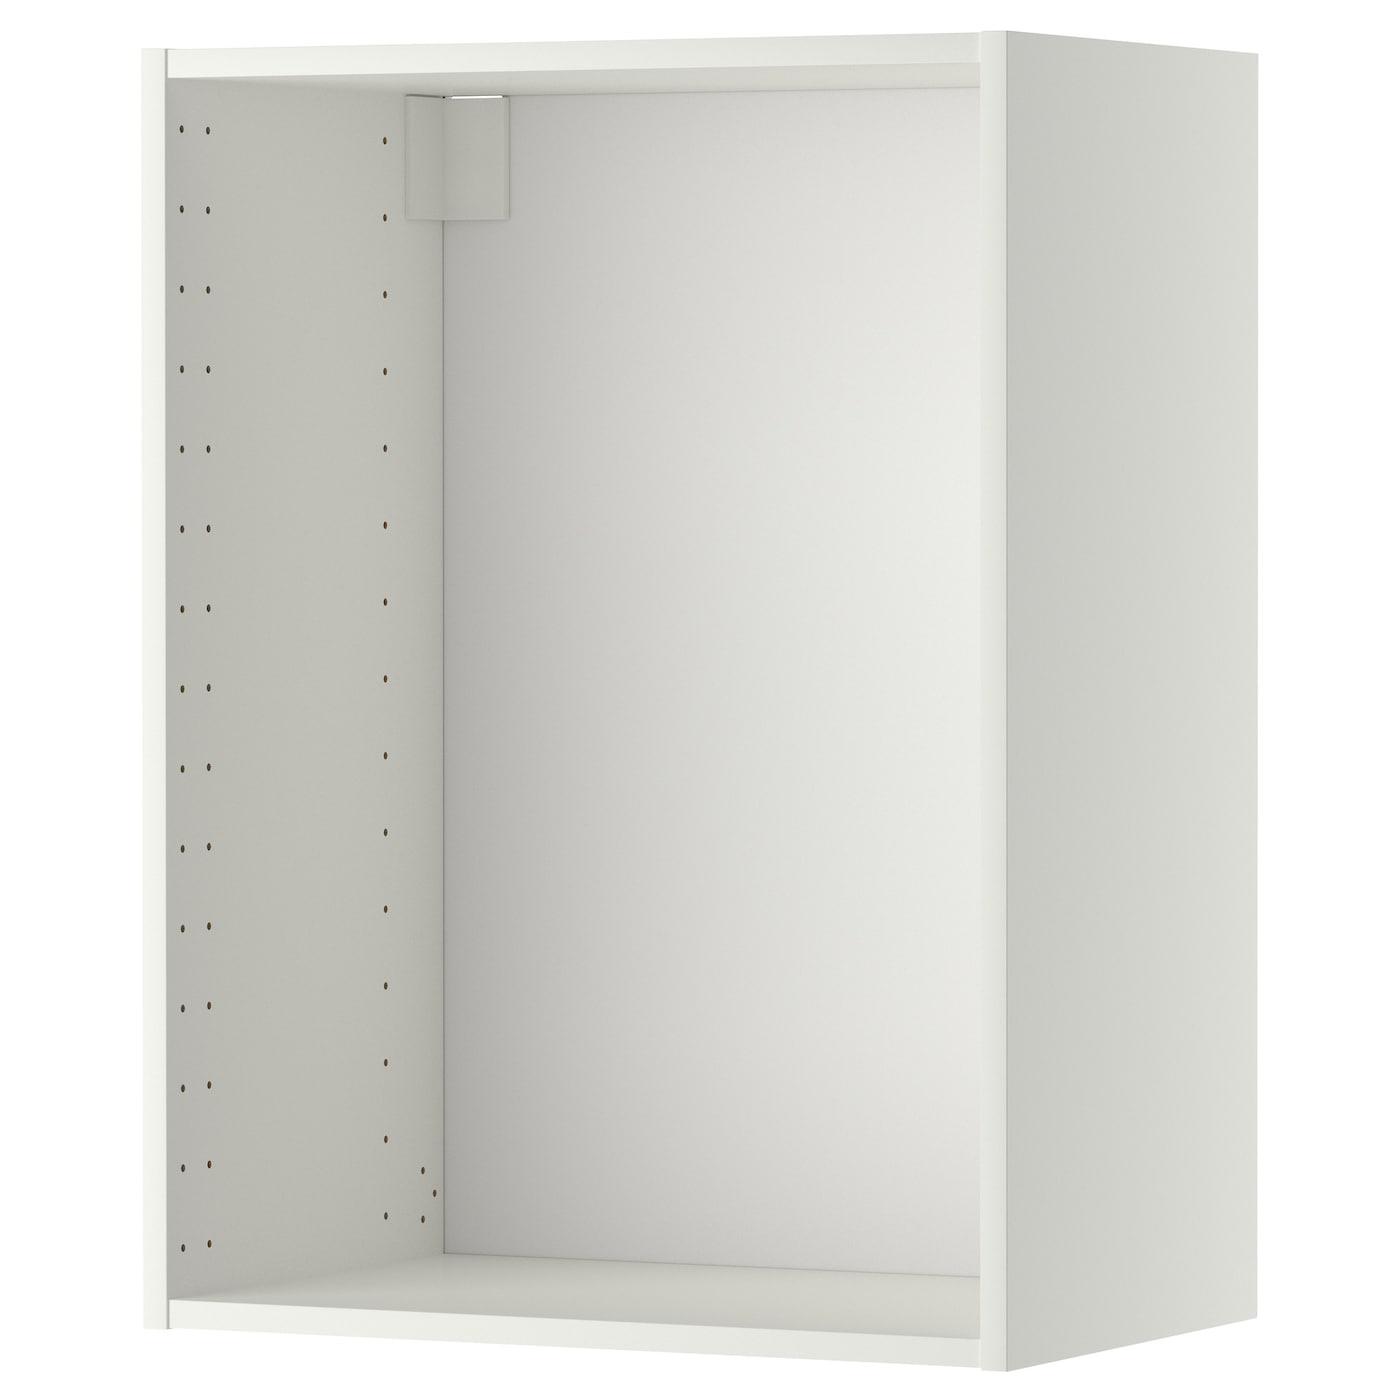 Altezza Cucina Ikea metod wall cabinet frame - white 60x37x80 cm